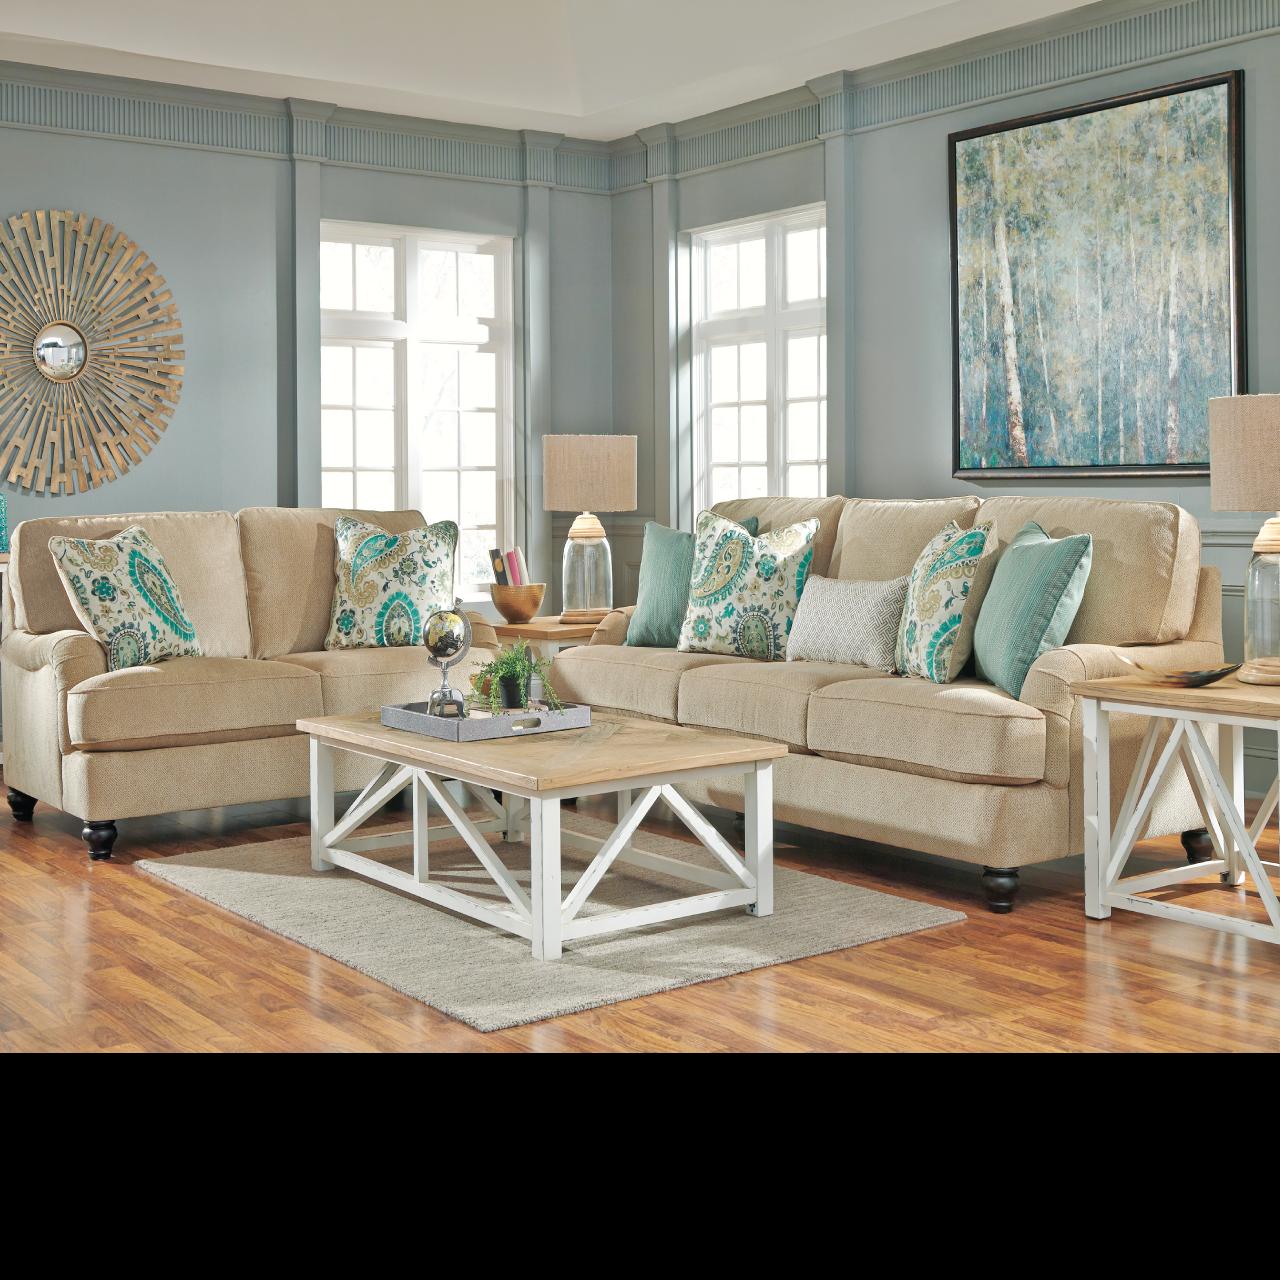 coastal living room furniture sets beautiful rooms pinterest ideas lochian sofa by ashley at kensington i love this entire design